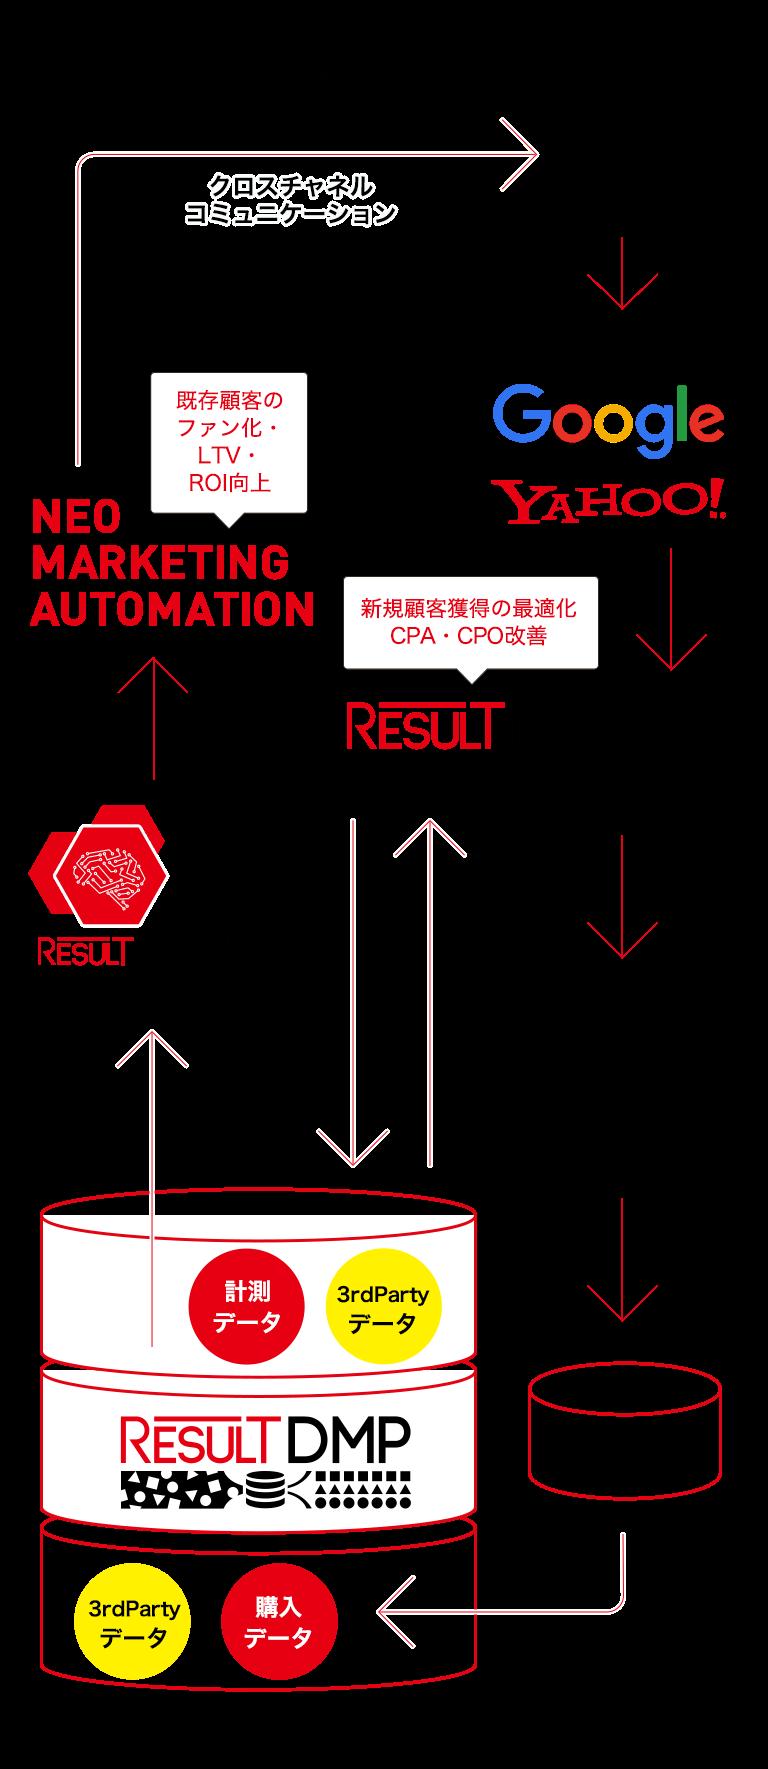 WEB広告 Google YAHOO! 新規顧客獲得の最適化 CPA・CPO改善 ECカート 基幹システムDB 計測データ 3rdPartyデータ RESULT DMP RESULT MASTER AIによるサジェスト 既存顧客のファン化 LTV・ROI向上 NEO MARKETING AUTOMATION クロスチャネルコミュニケーション